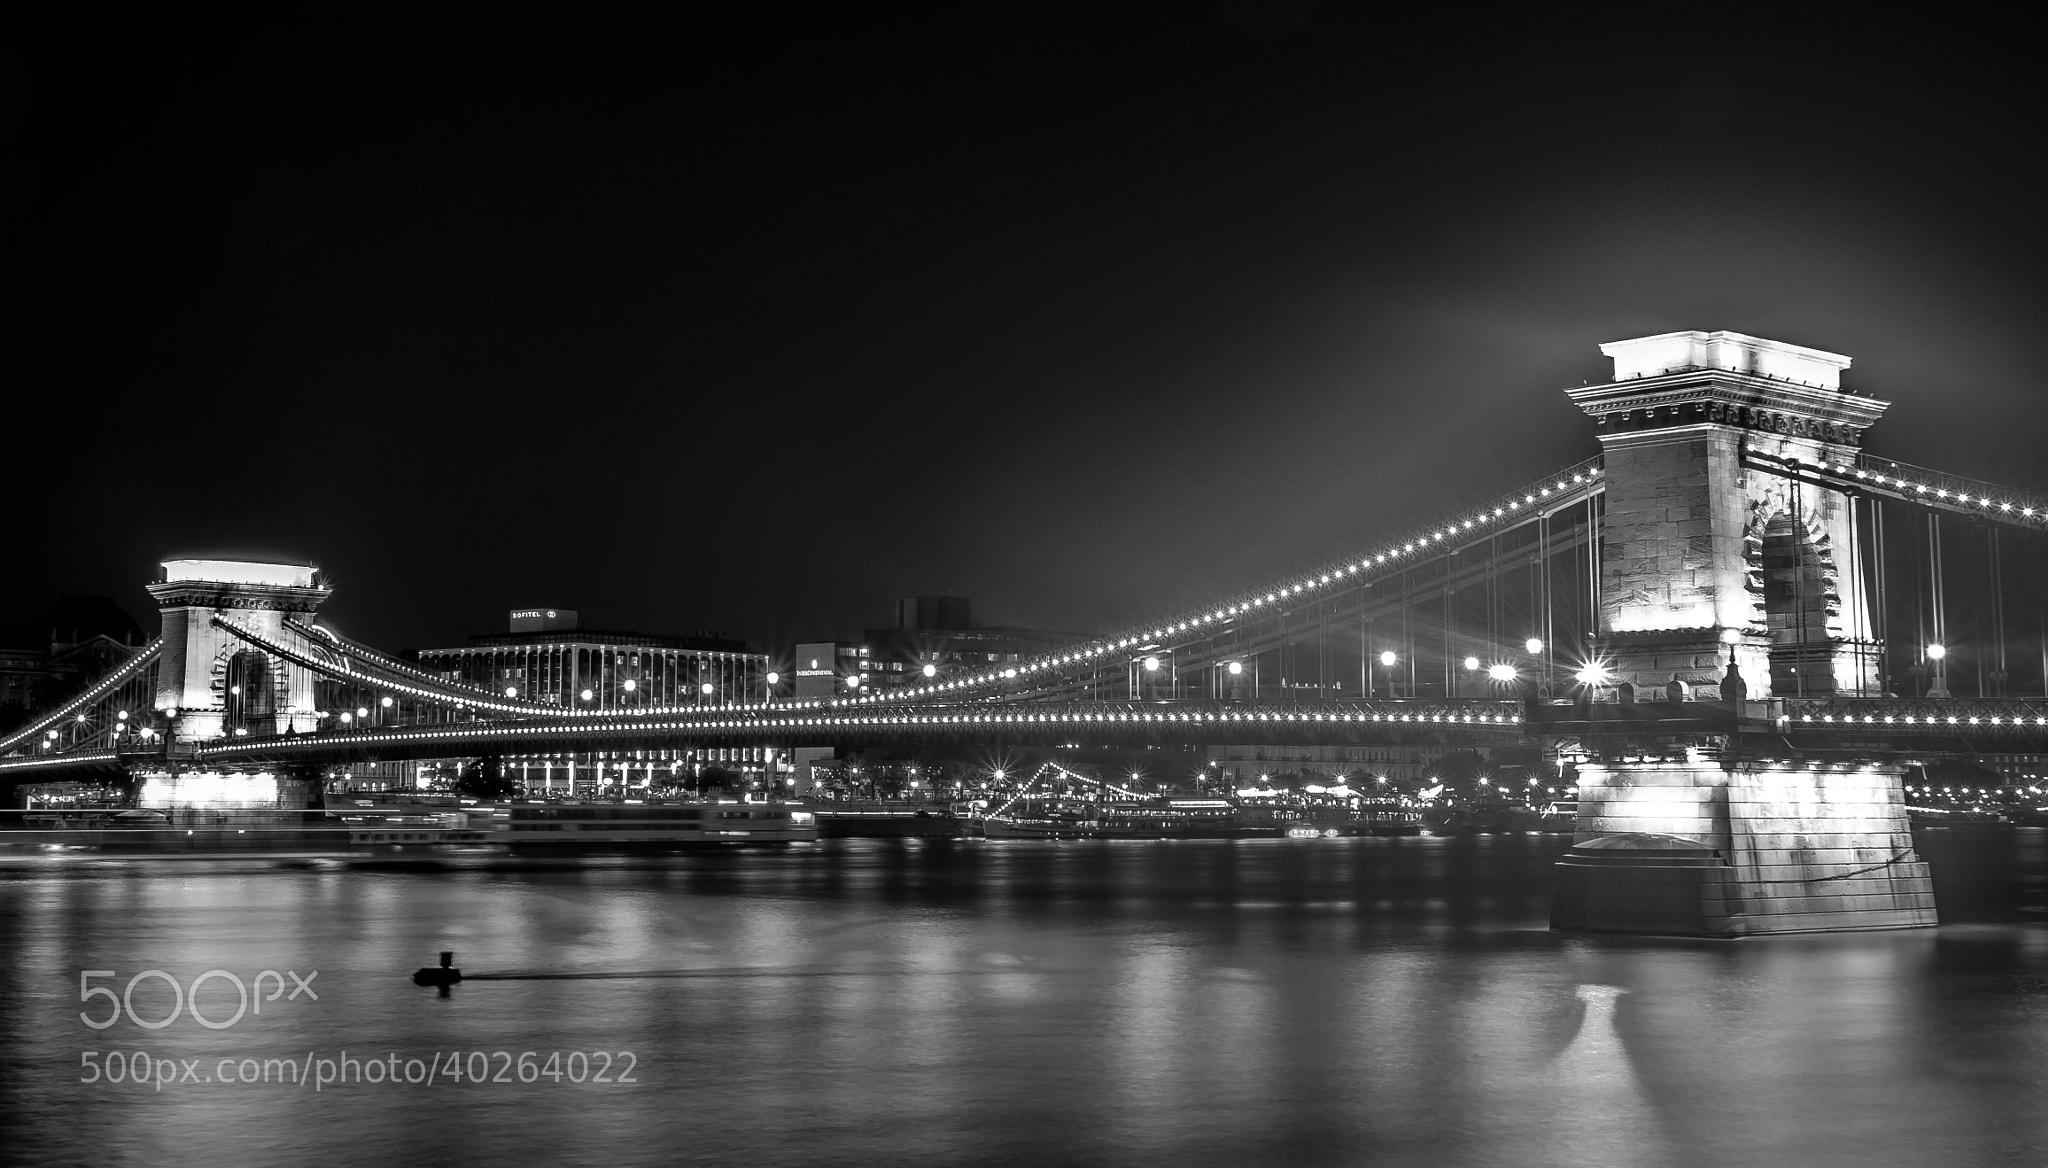 Photograph Chain Bridge B&W by p5000 on 500px